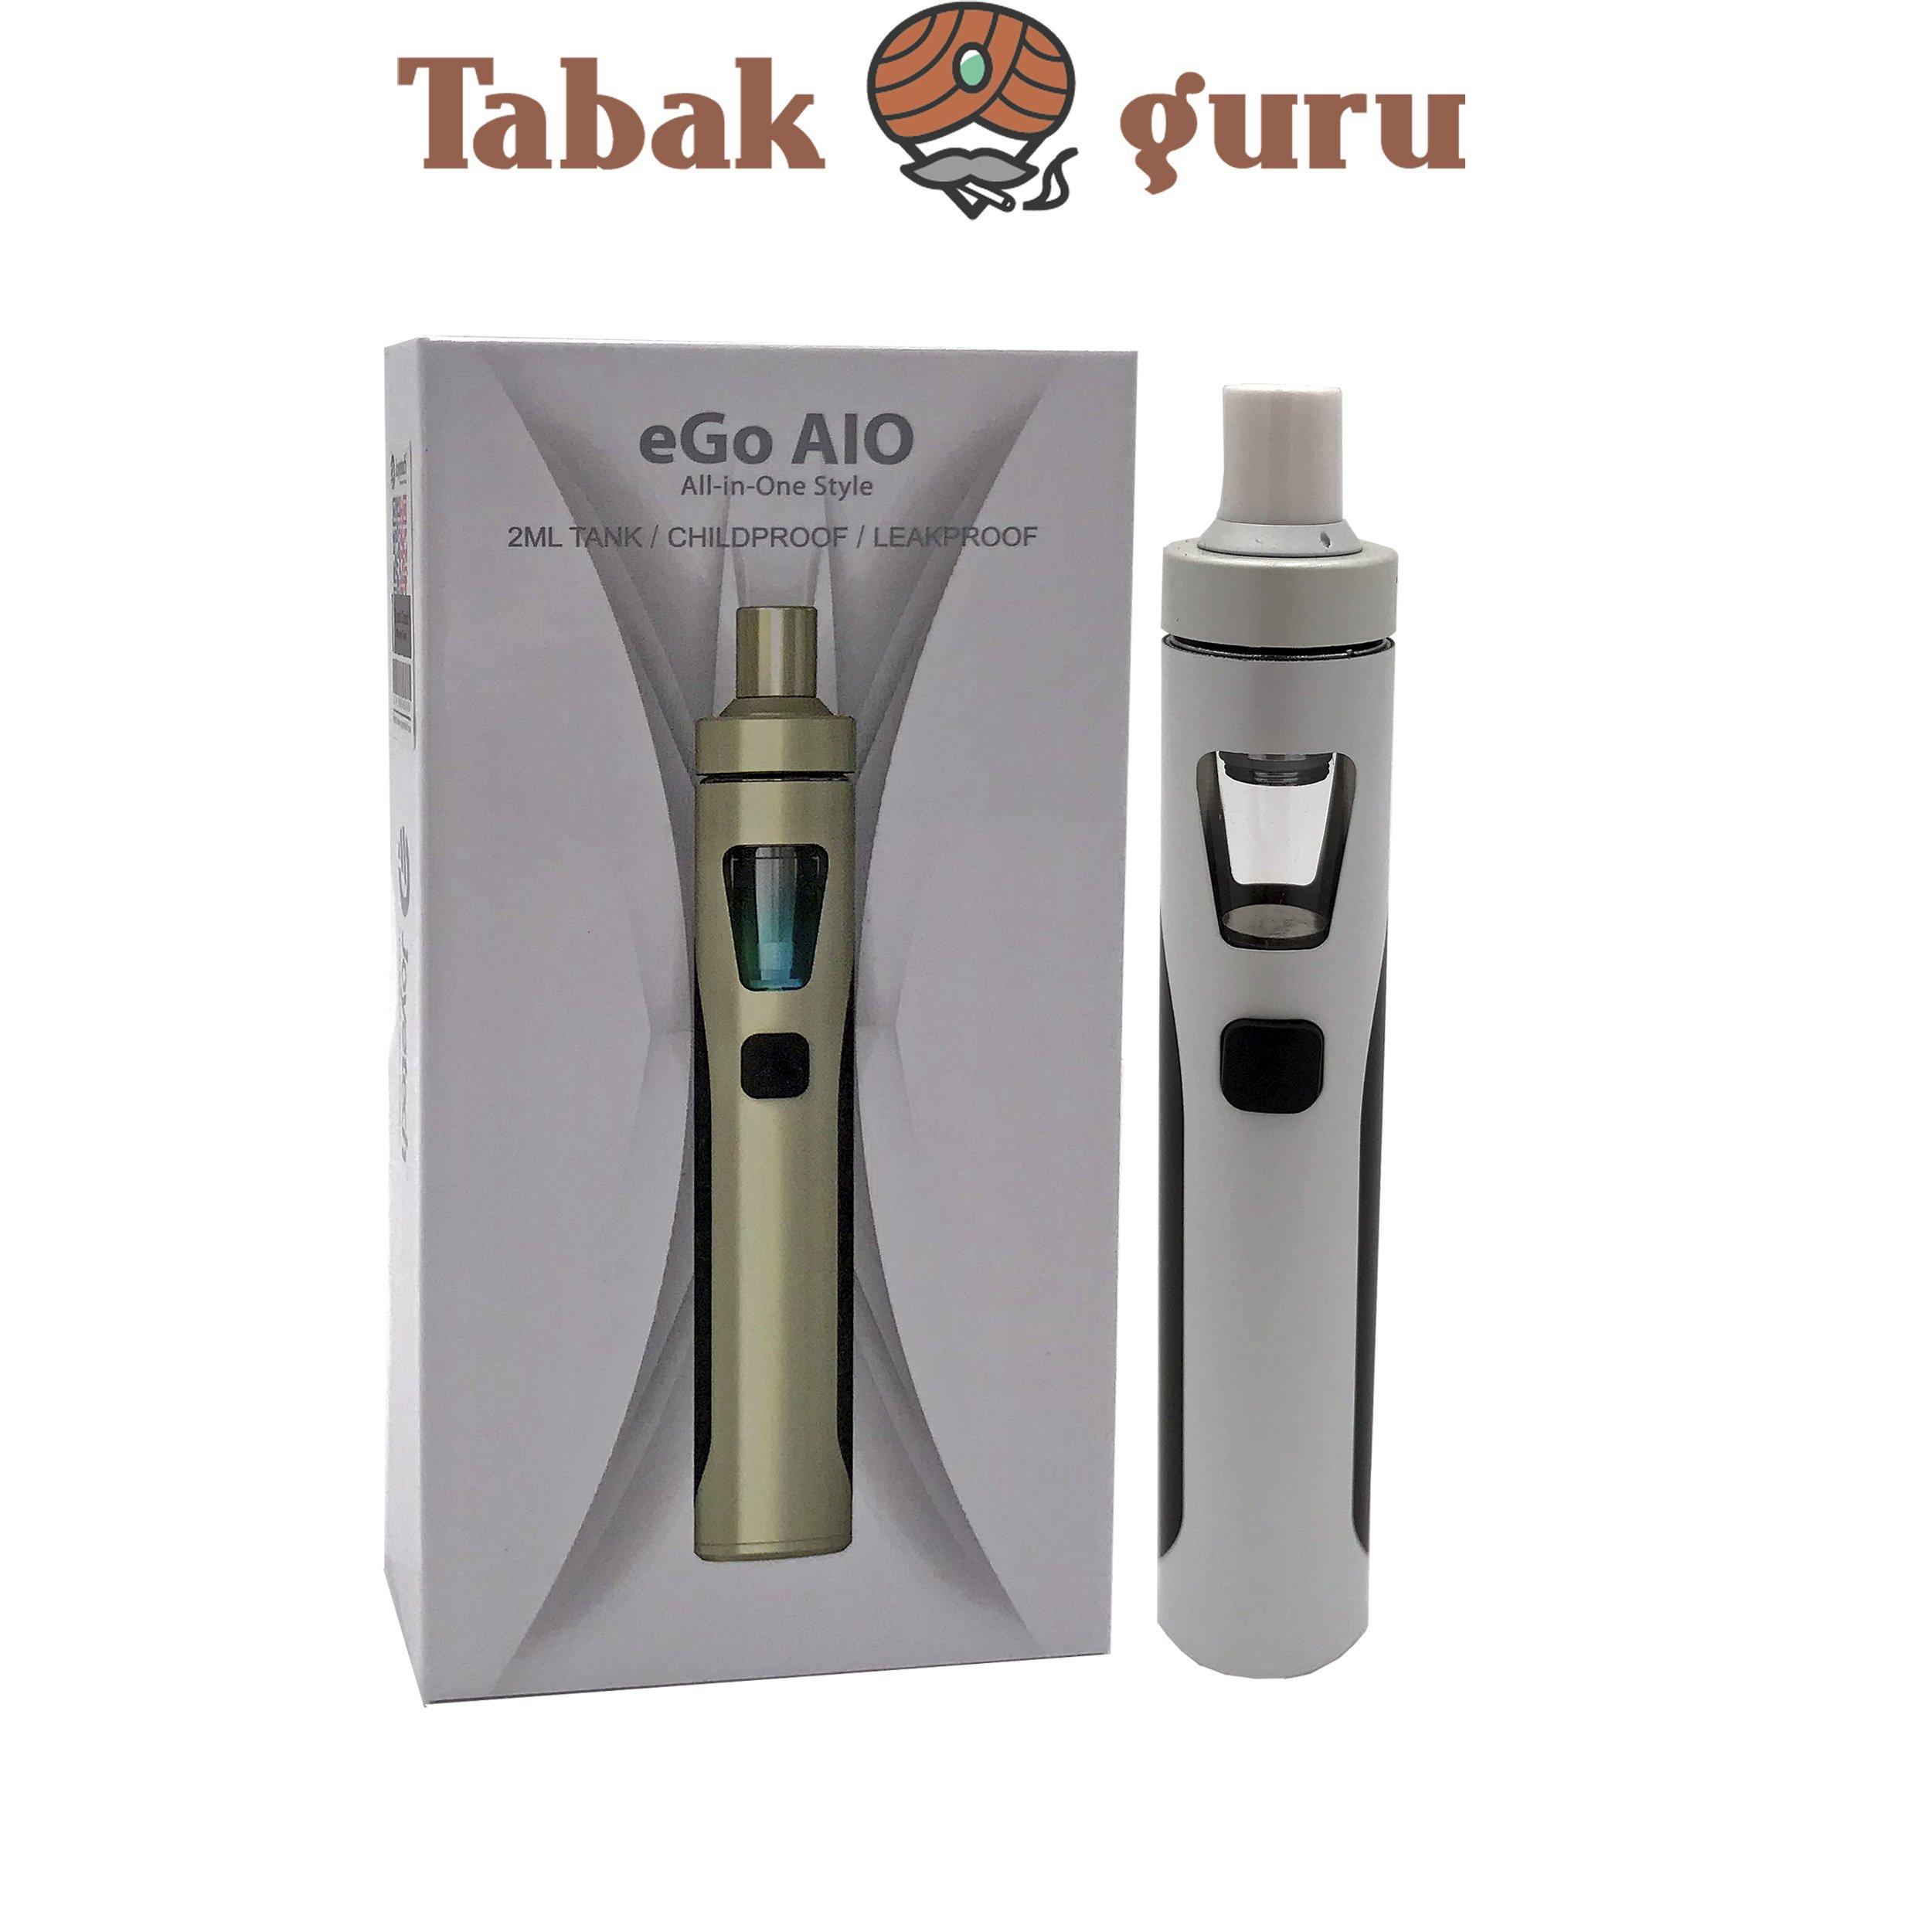 Joyetech eGo AlO All-in-One Style E-Zigarette Weiß/Schwarz